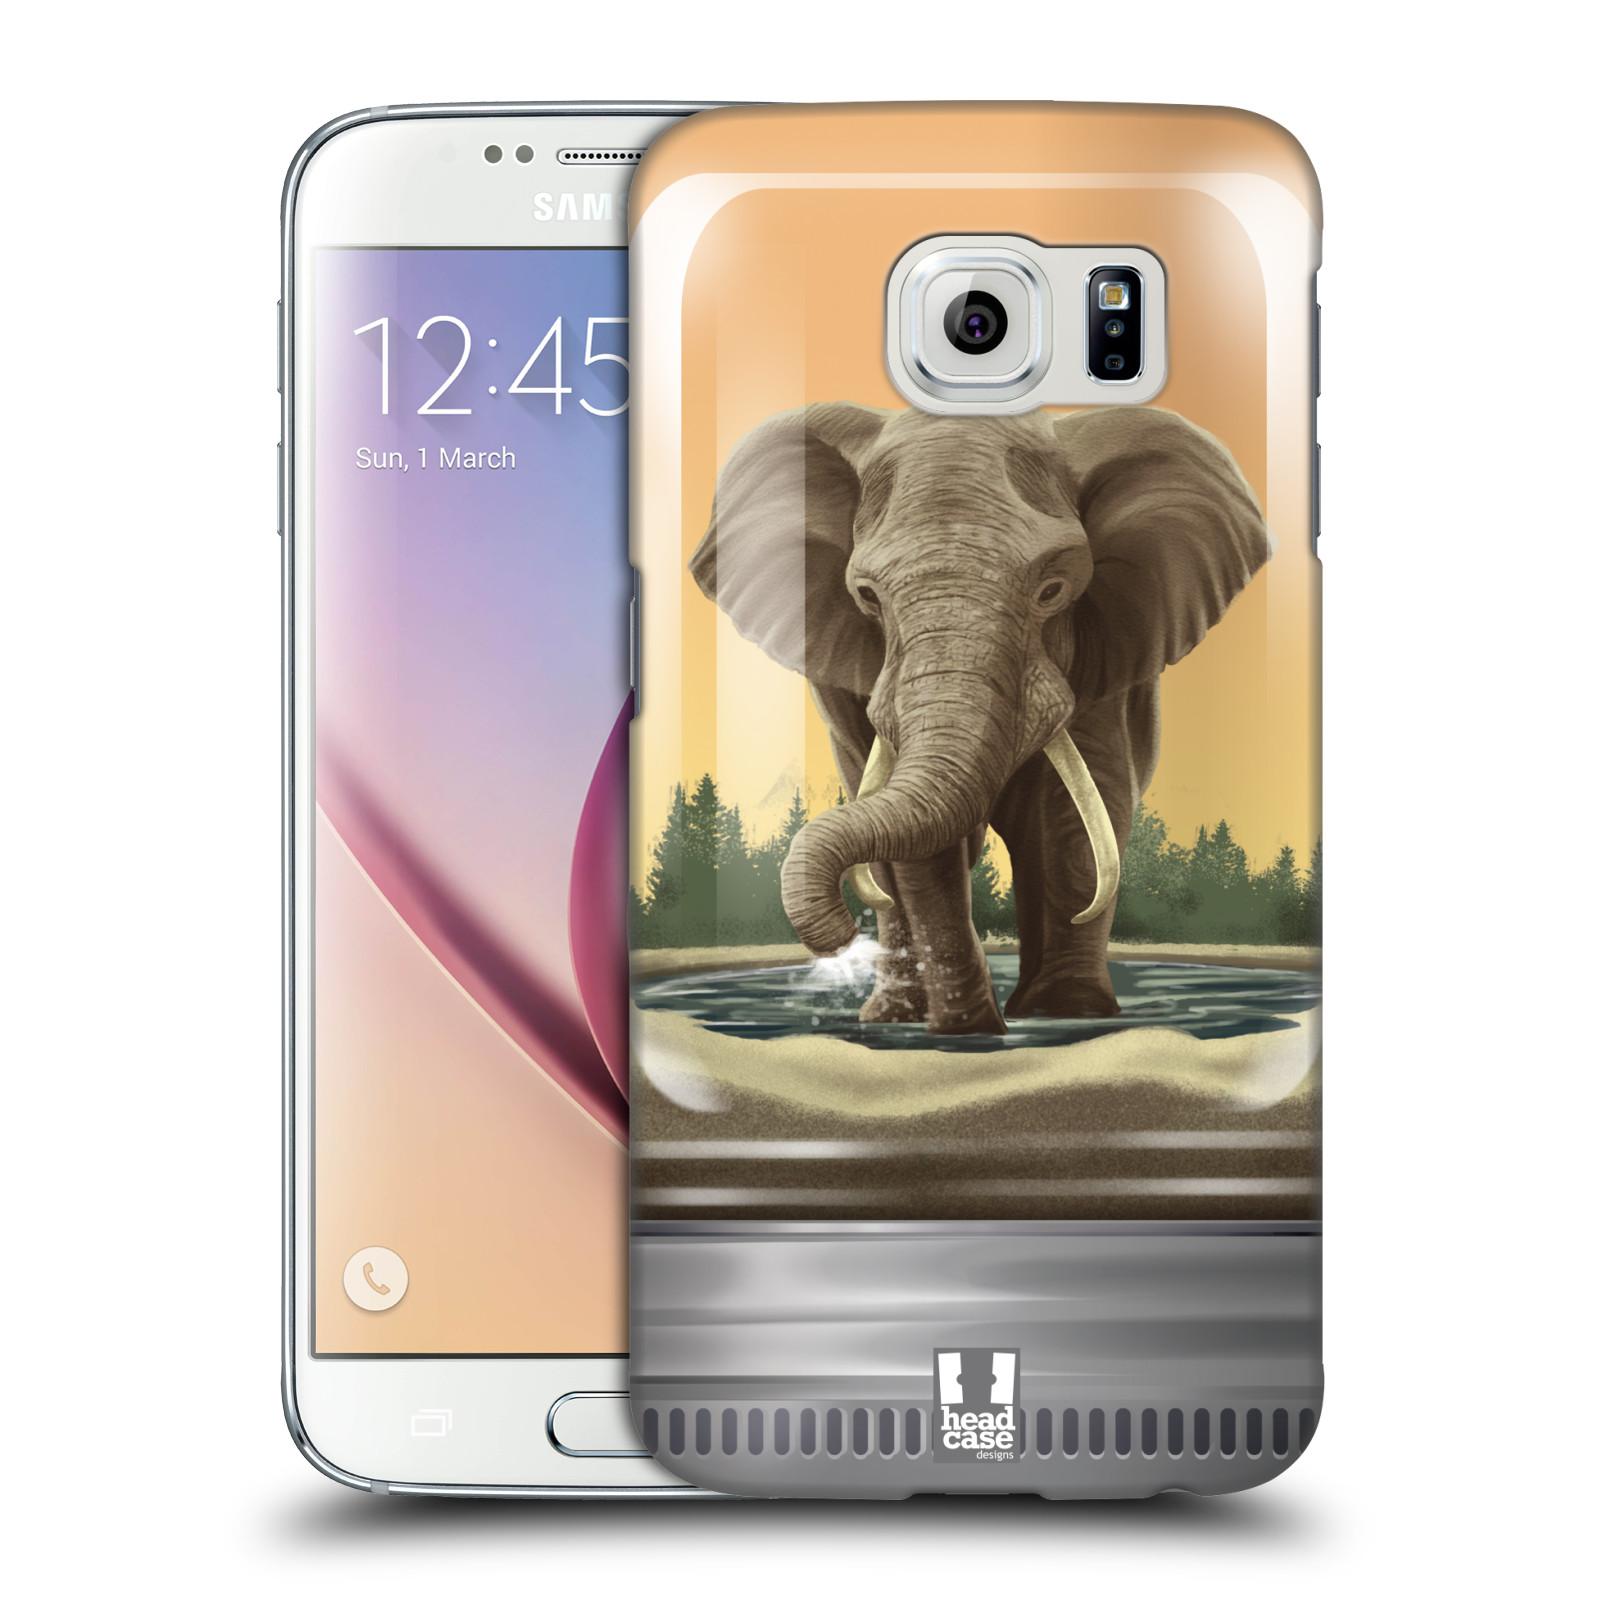 HEAD CASE plastový obal na mobil SAMSUNG Galaxy S6 (G9200, G920F) vzor Zvířátka v těžítku slon